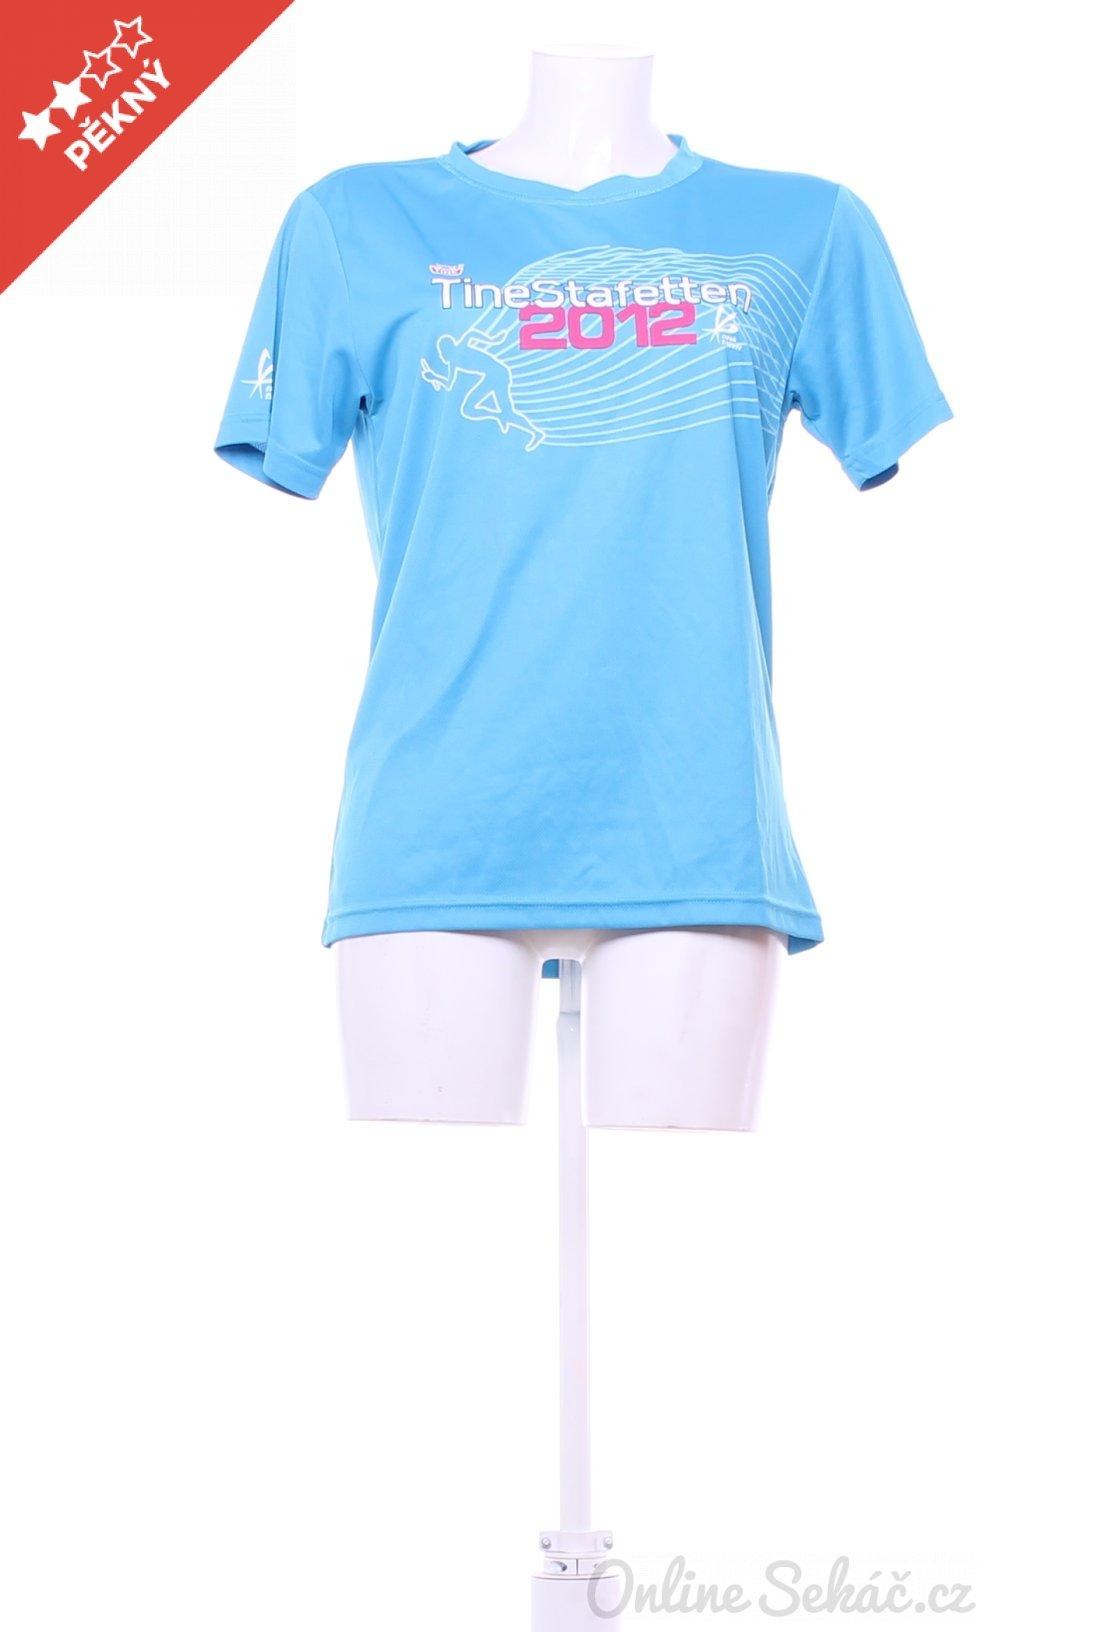 b583f2db4282 Dámské tričko s potiskem TINE STAFETTEN XL